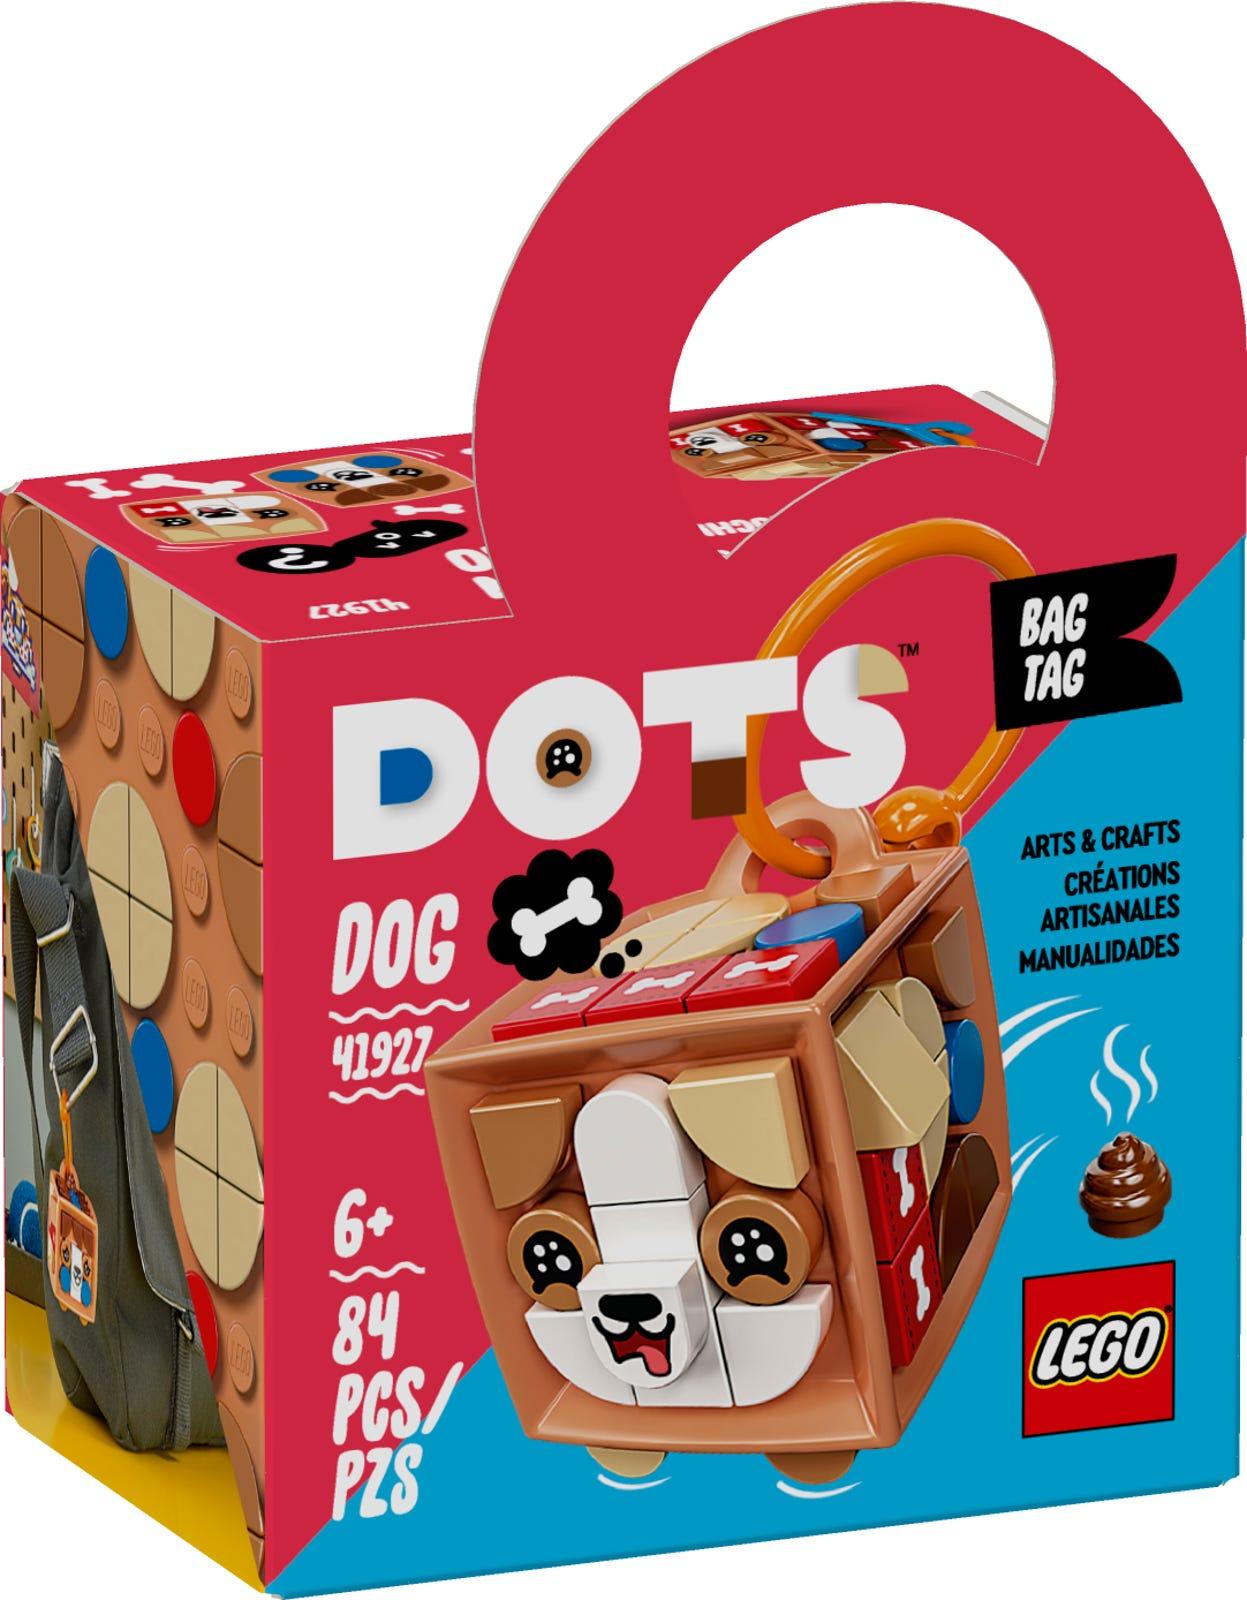 LEGO DOTS BAG TAG - CAGNOLINO 41927